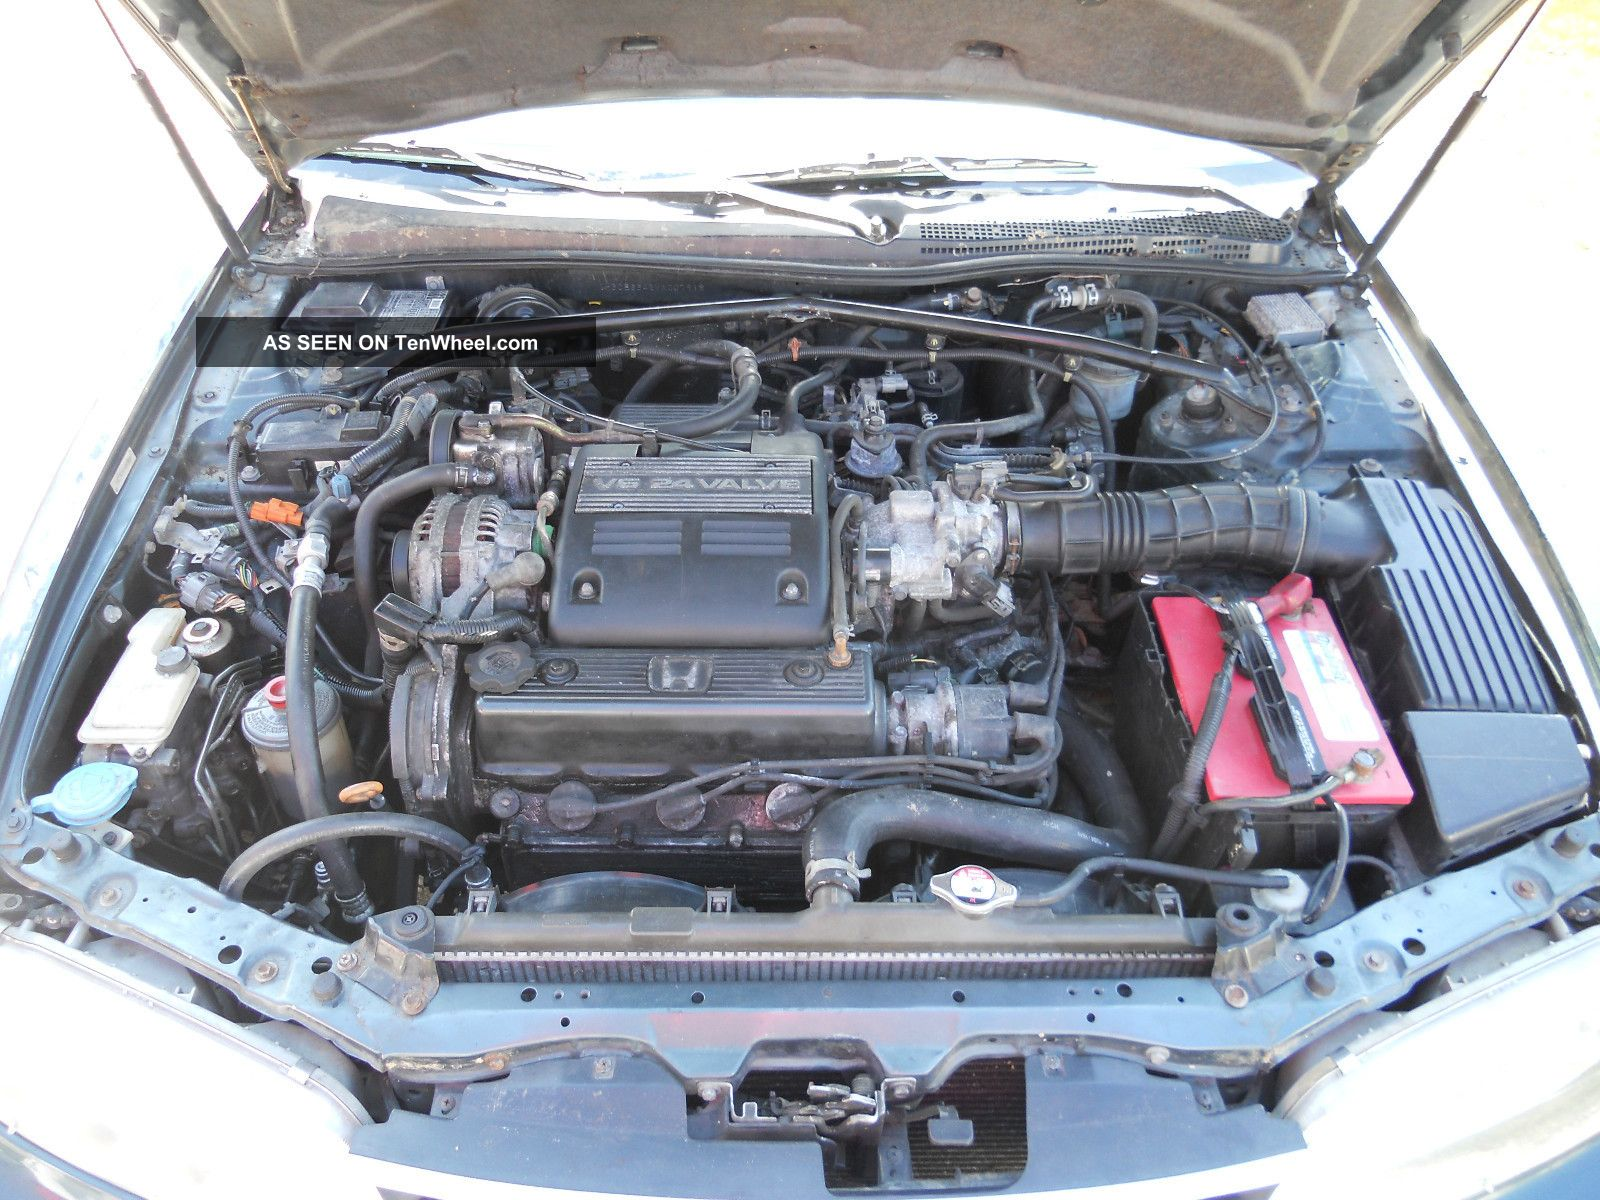 1997 honda accord 2 7l engine diagram honda auto wiring. Black Bedroom Furniture Sets. Home Design Ideas